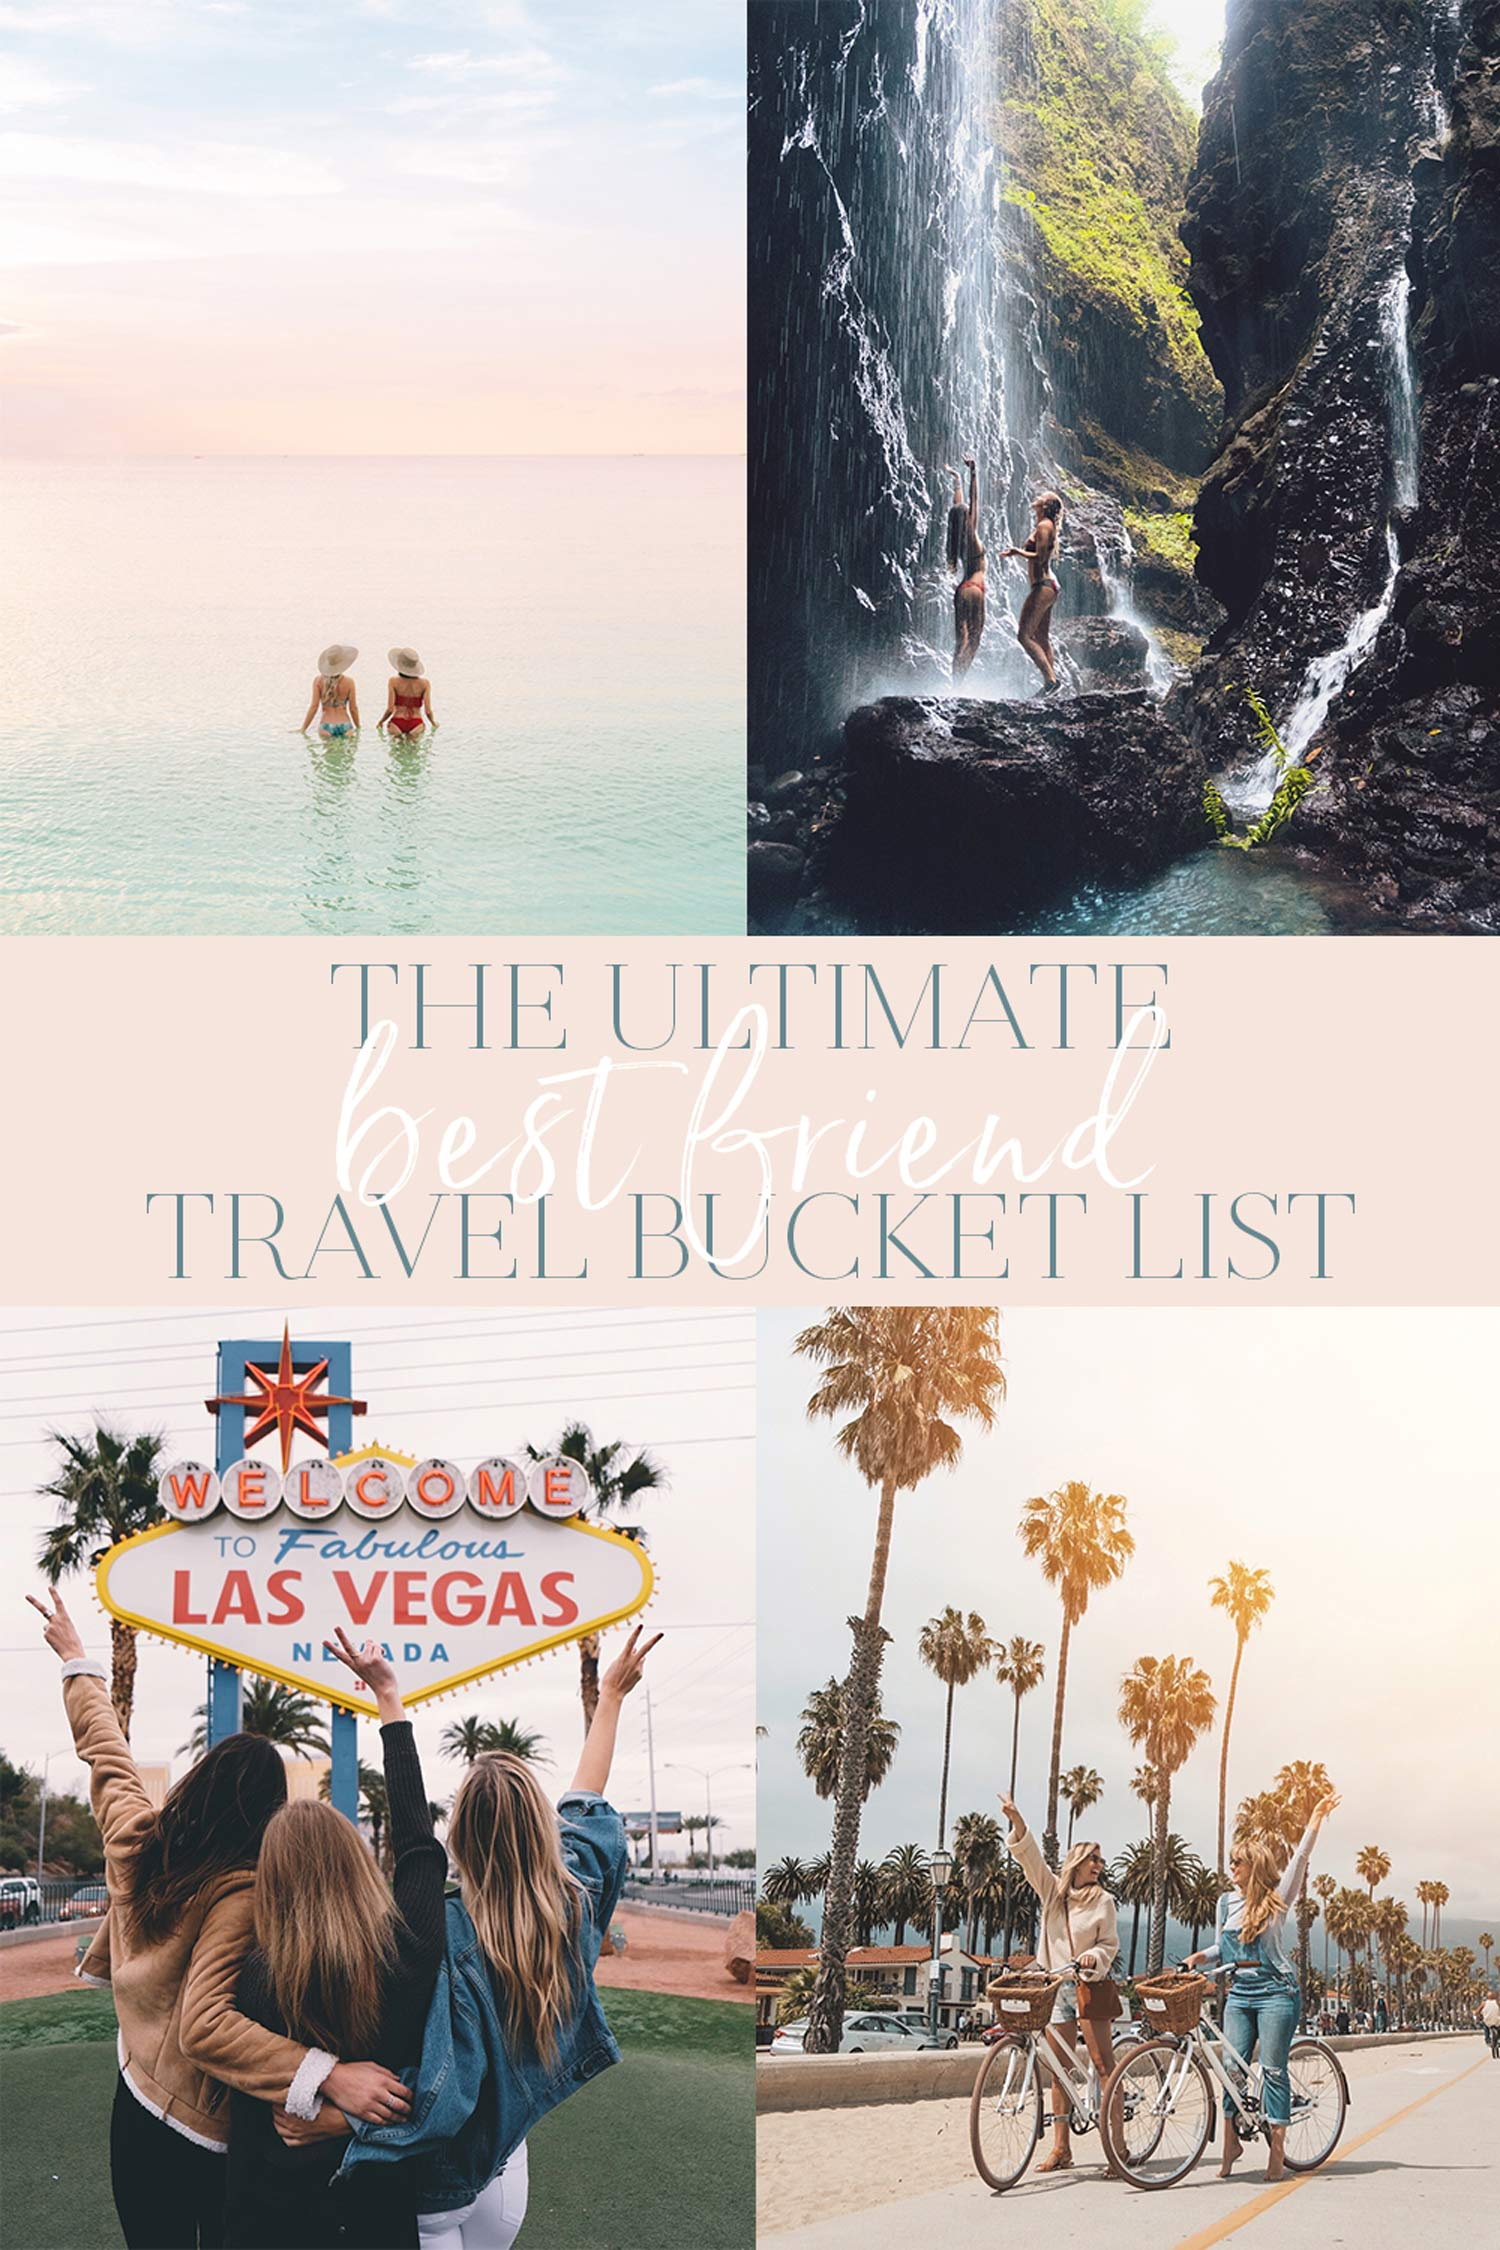 The Ultimate Best Friend Travel Bucket List